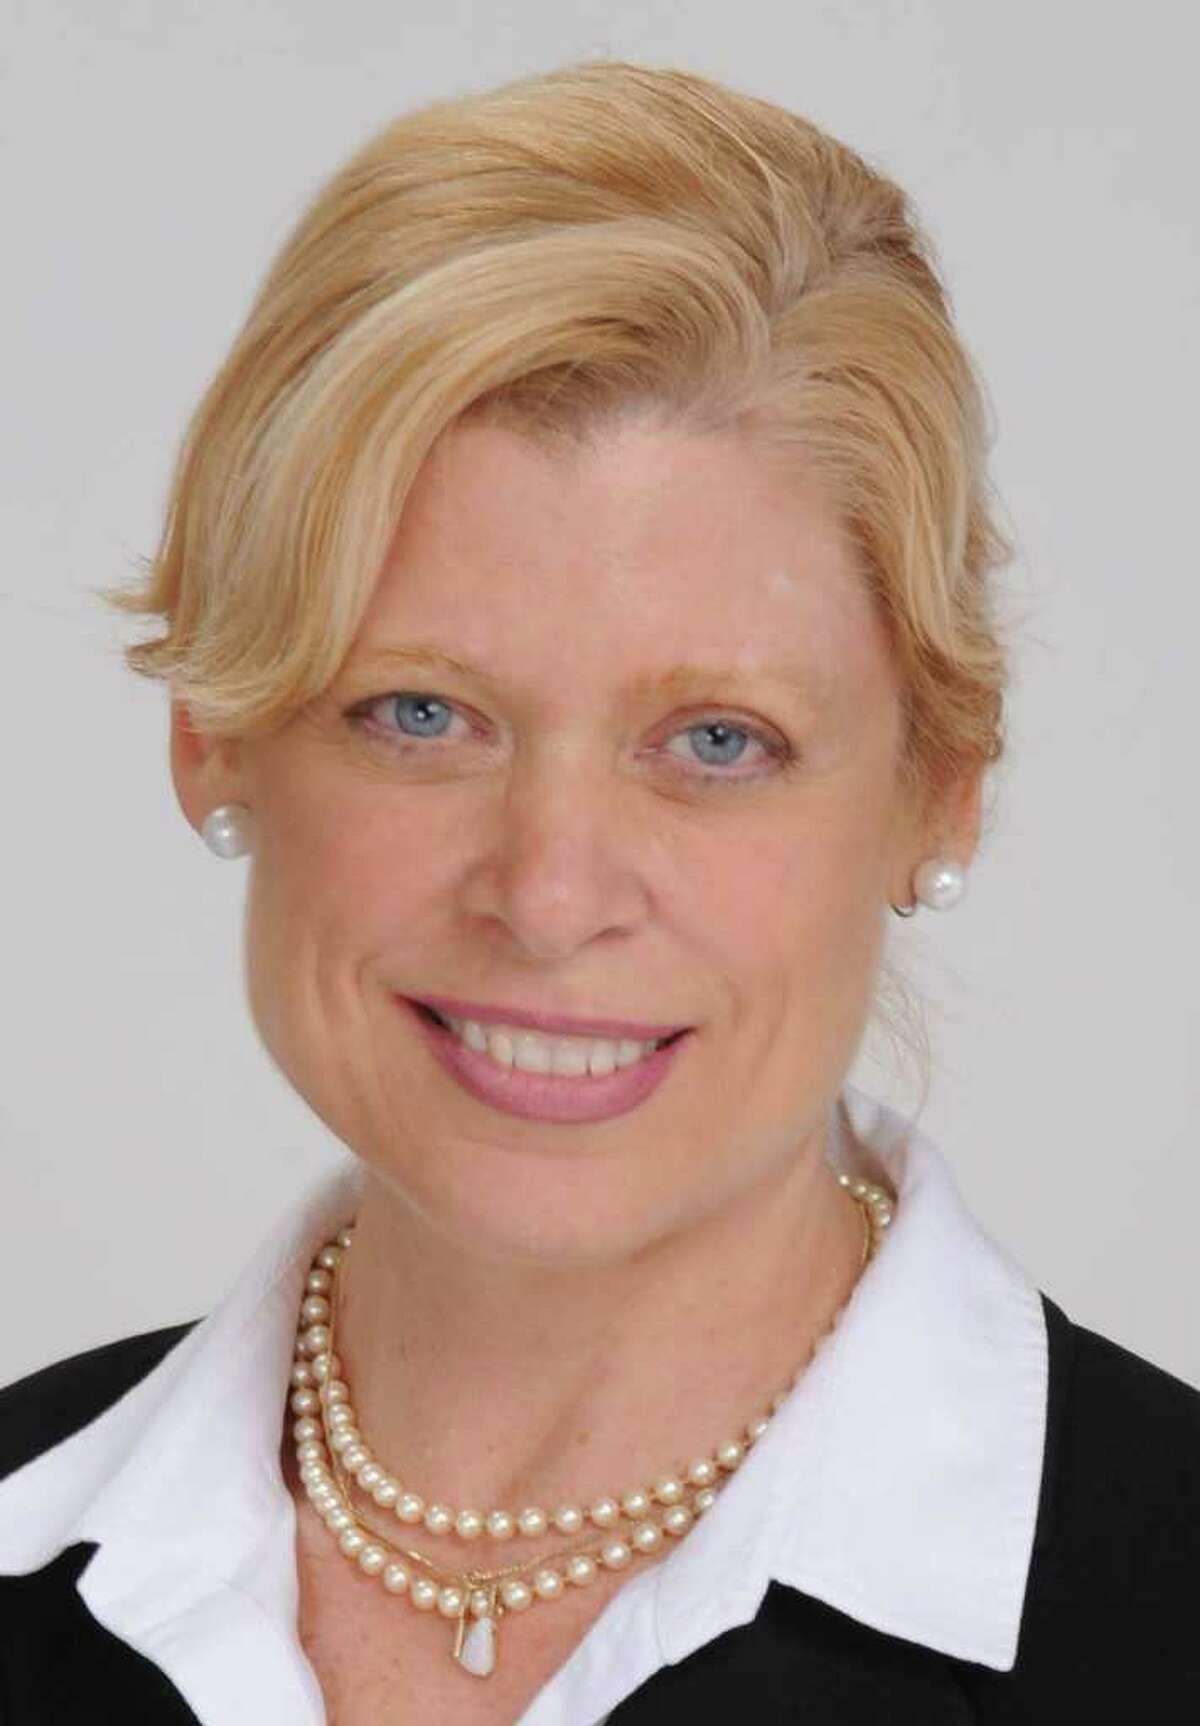 Martha Dean, Republican candidate for Attorney General